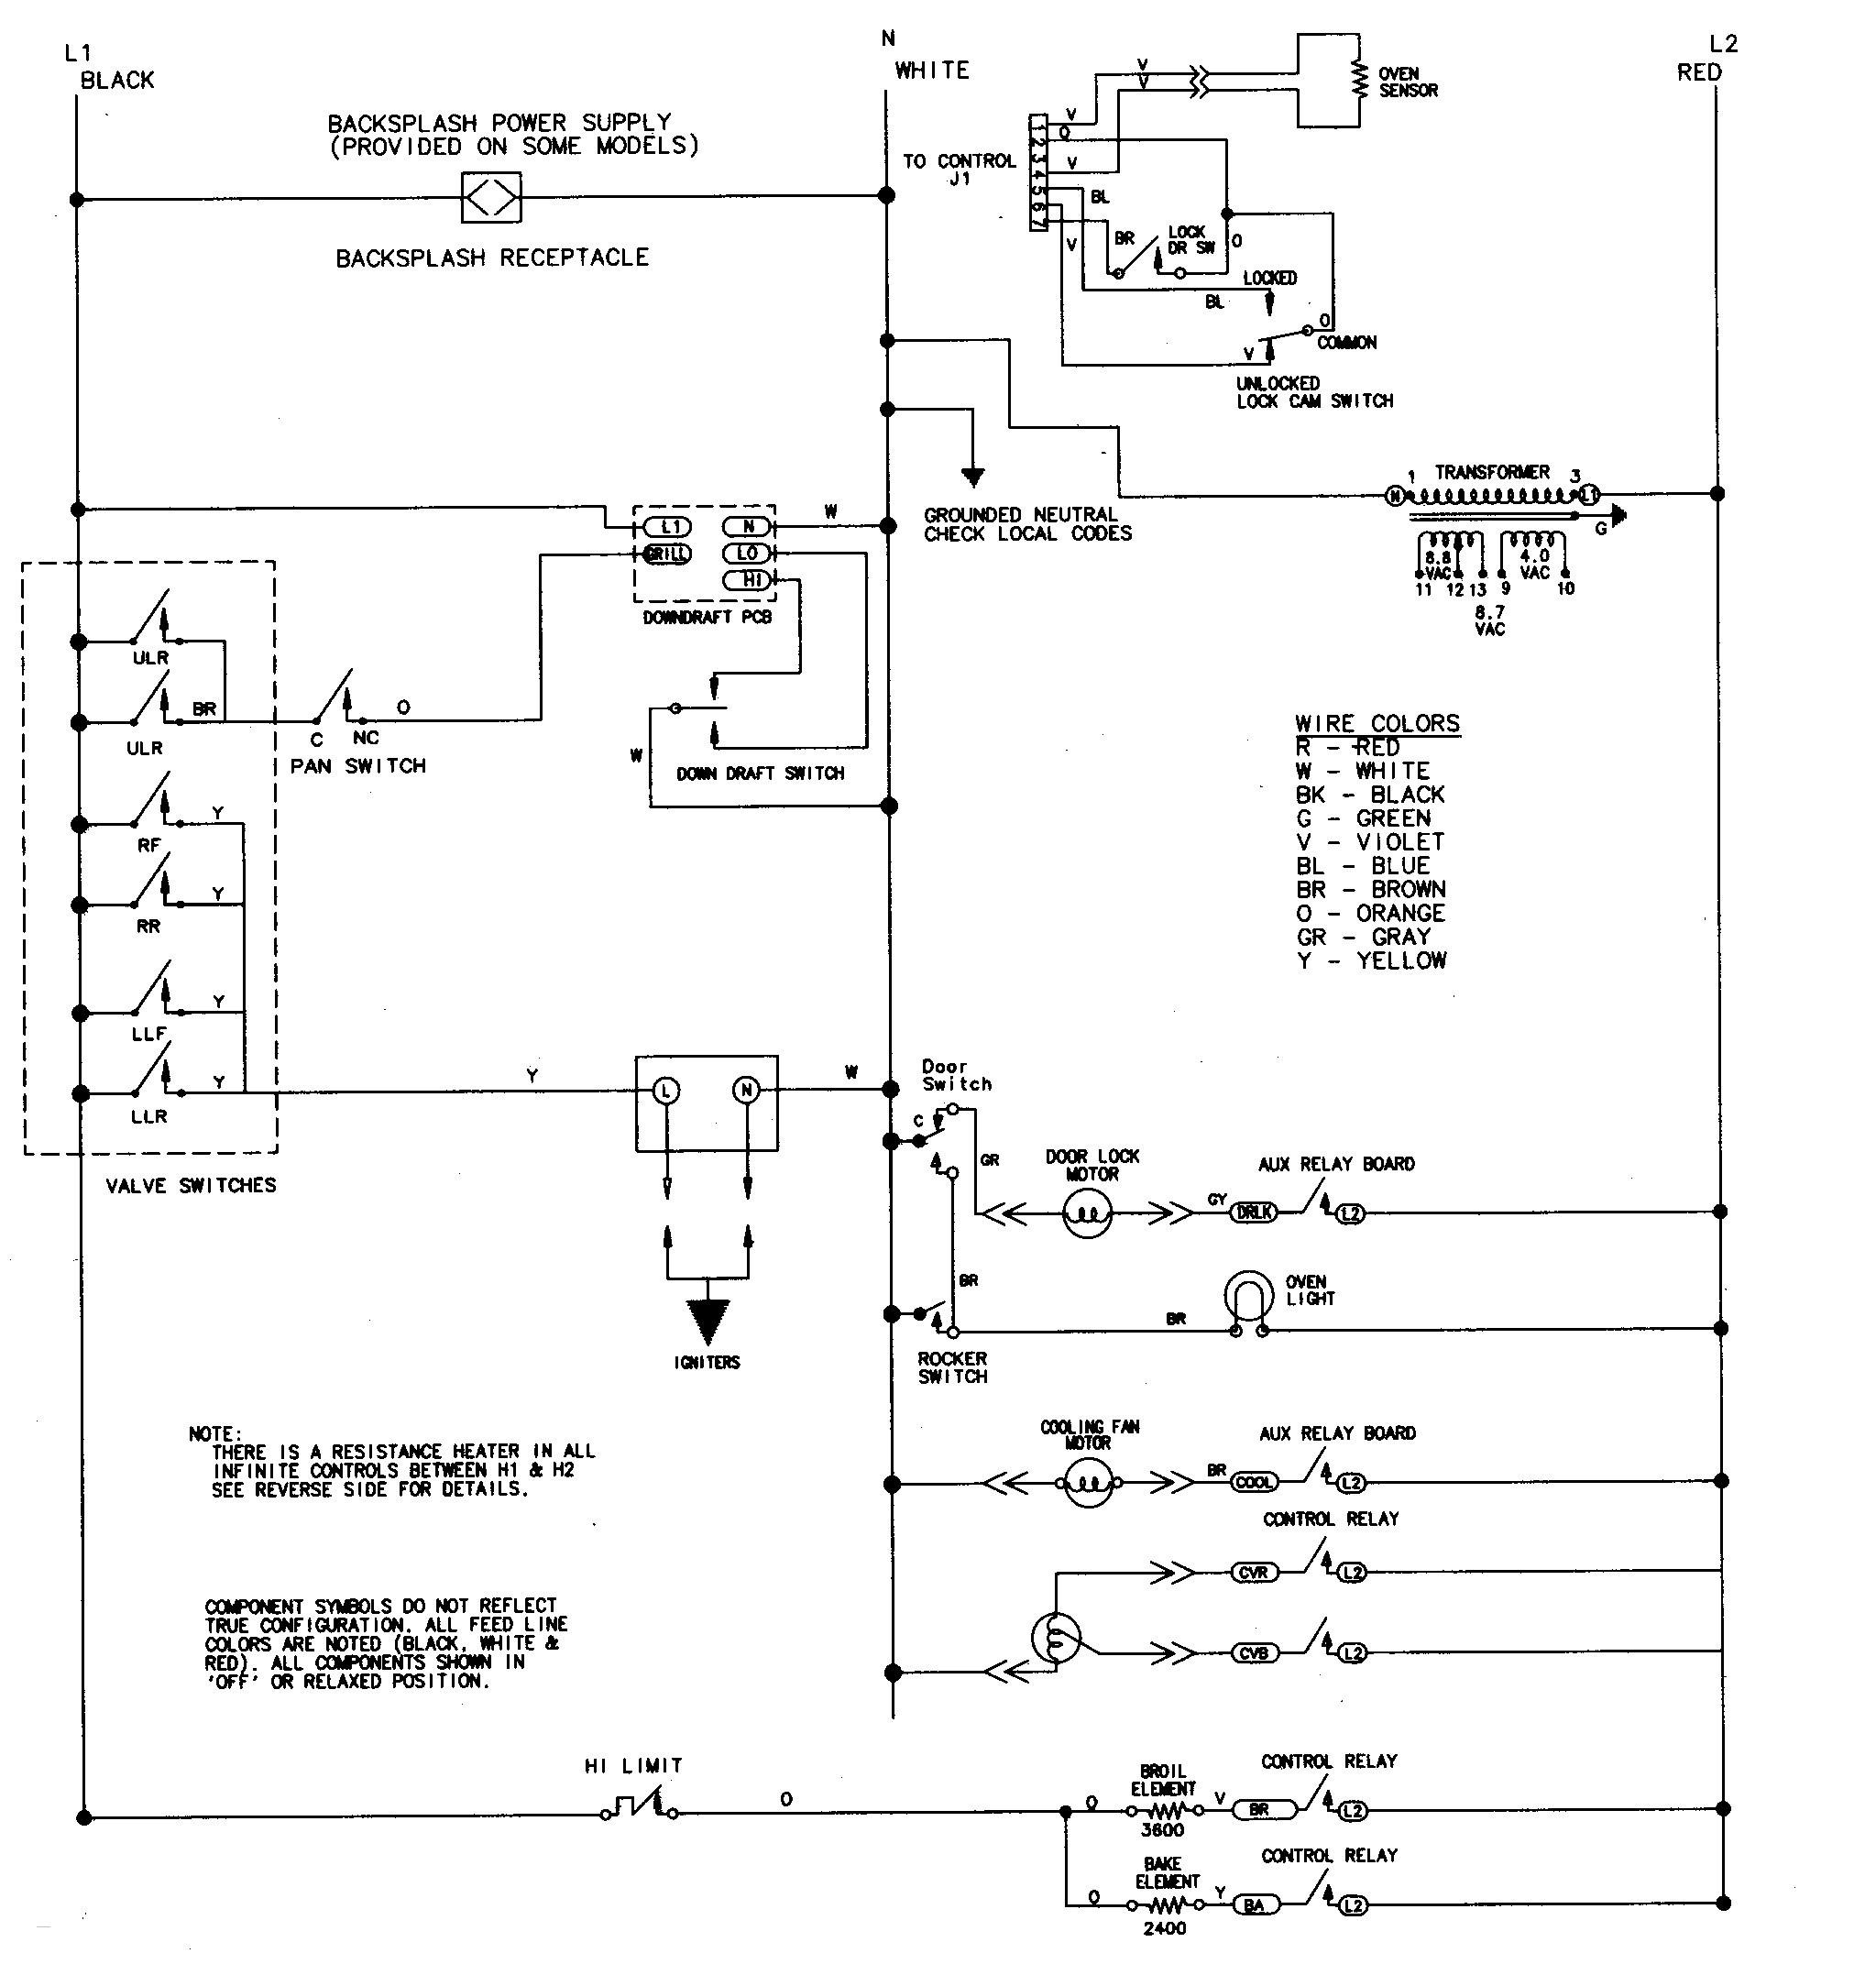 Electric Circuit Diagram Beautiful Famous Basic Oven Wiring Diagram Electrical Circuit